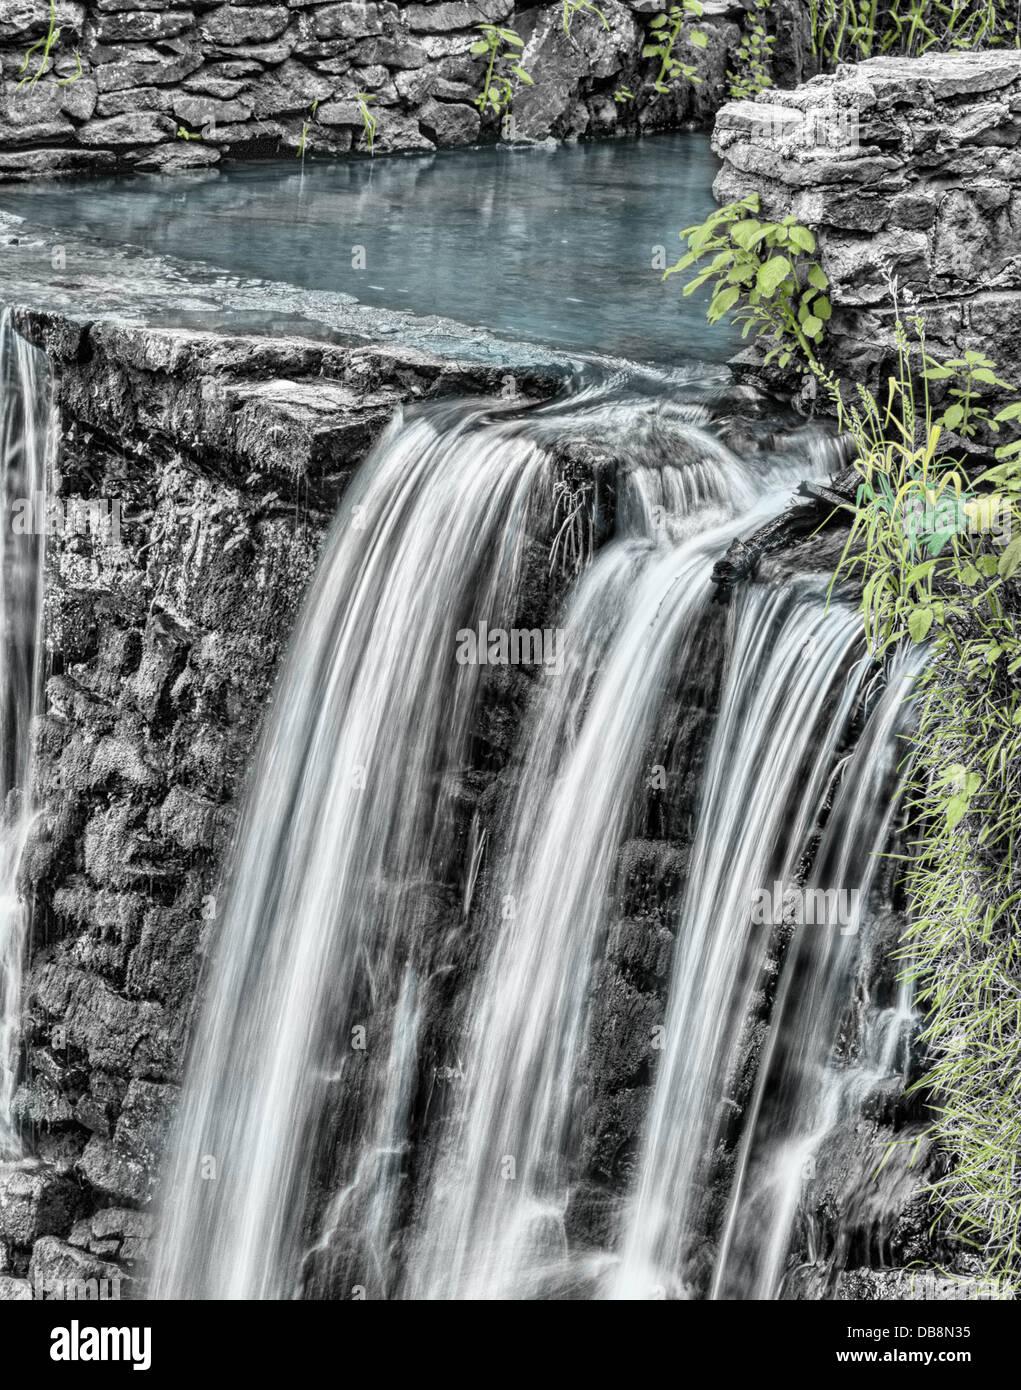 falls water cool clean crisp drop driven - Stock Image